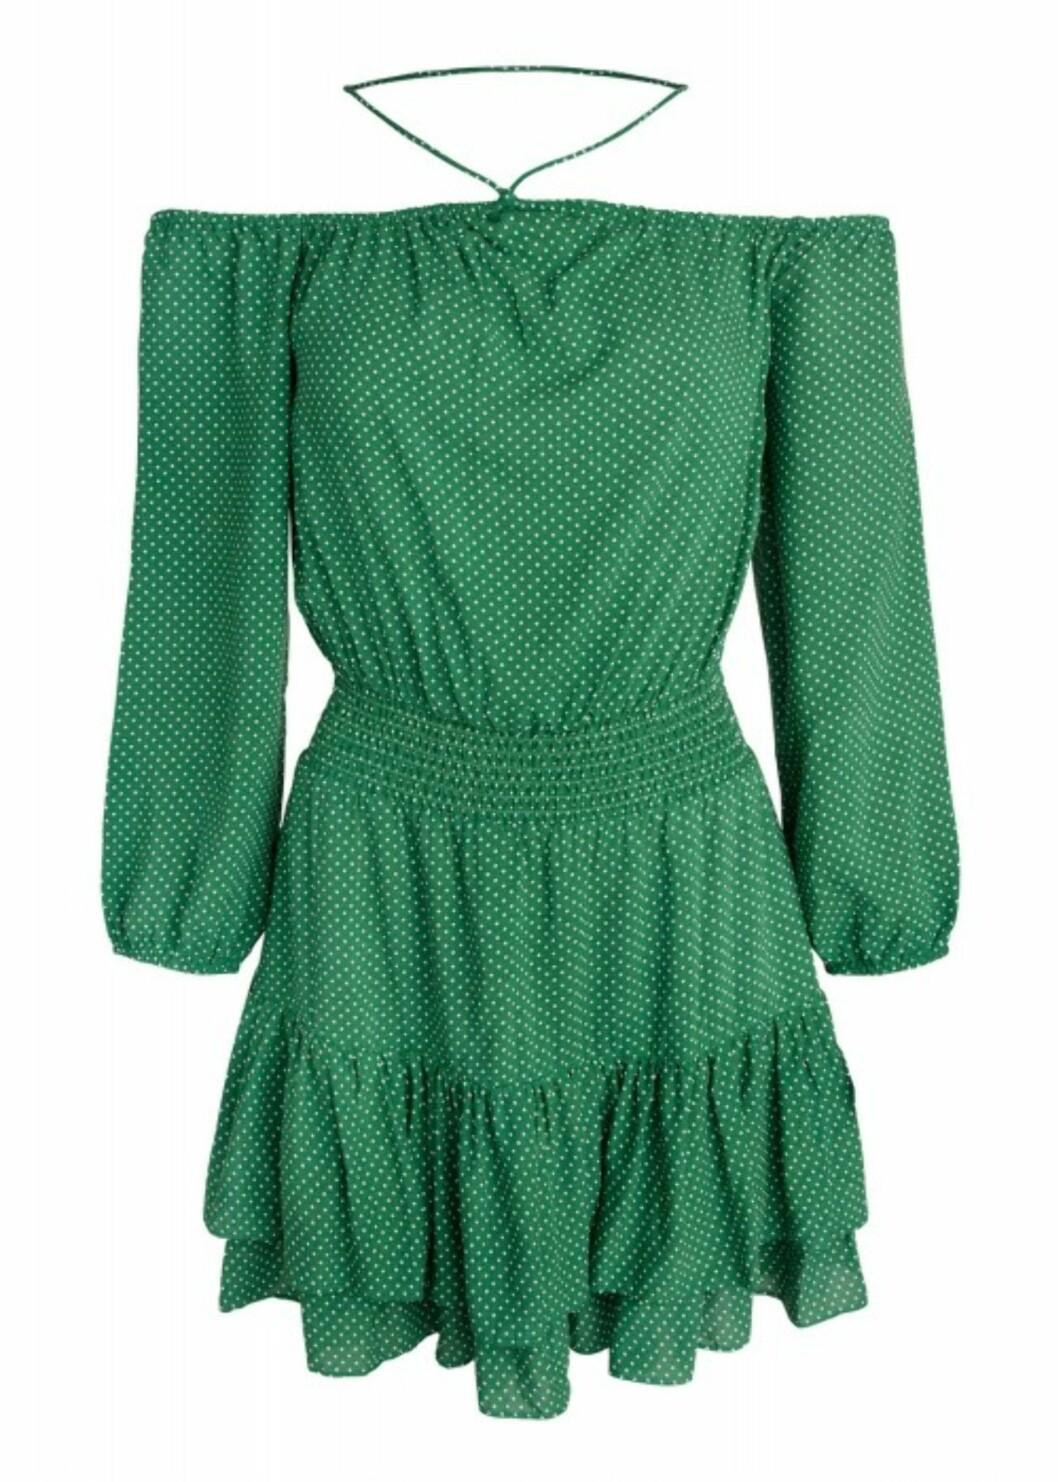 Kjole fra Designers Remix   kr 1800   https://www.designersremix.com/no/rion-dot-dress-57376.html